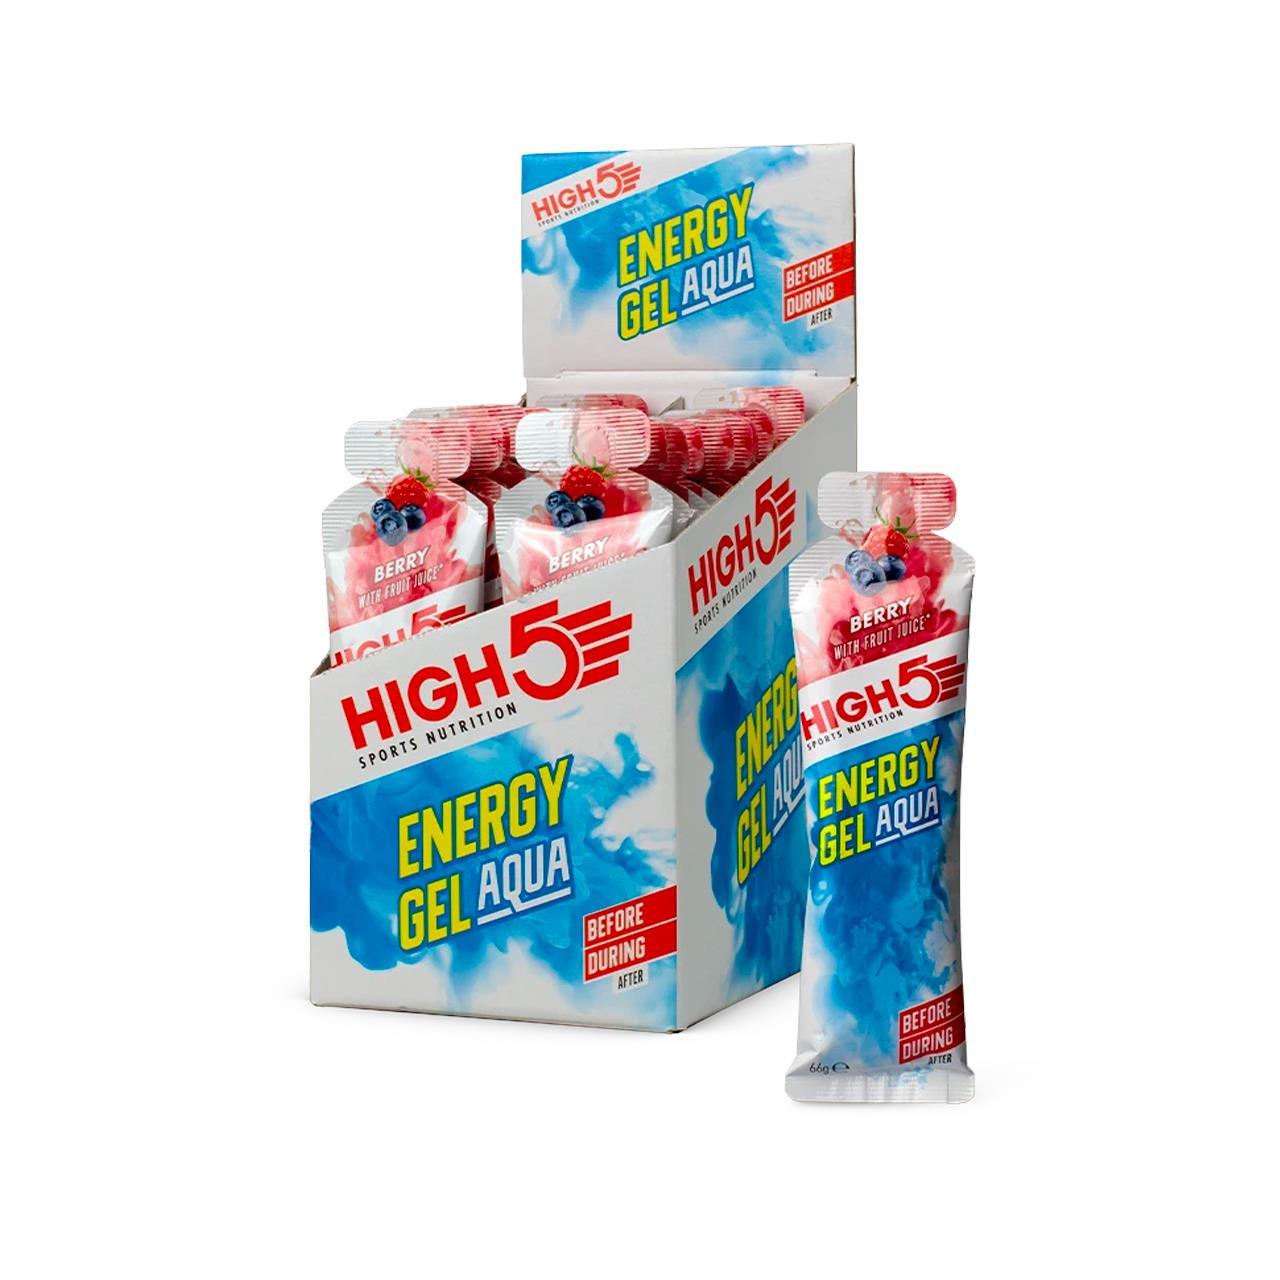 High5 Energy Gel Aqua, 20 Pack (Berry)